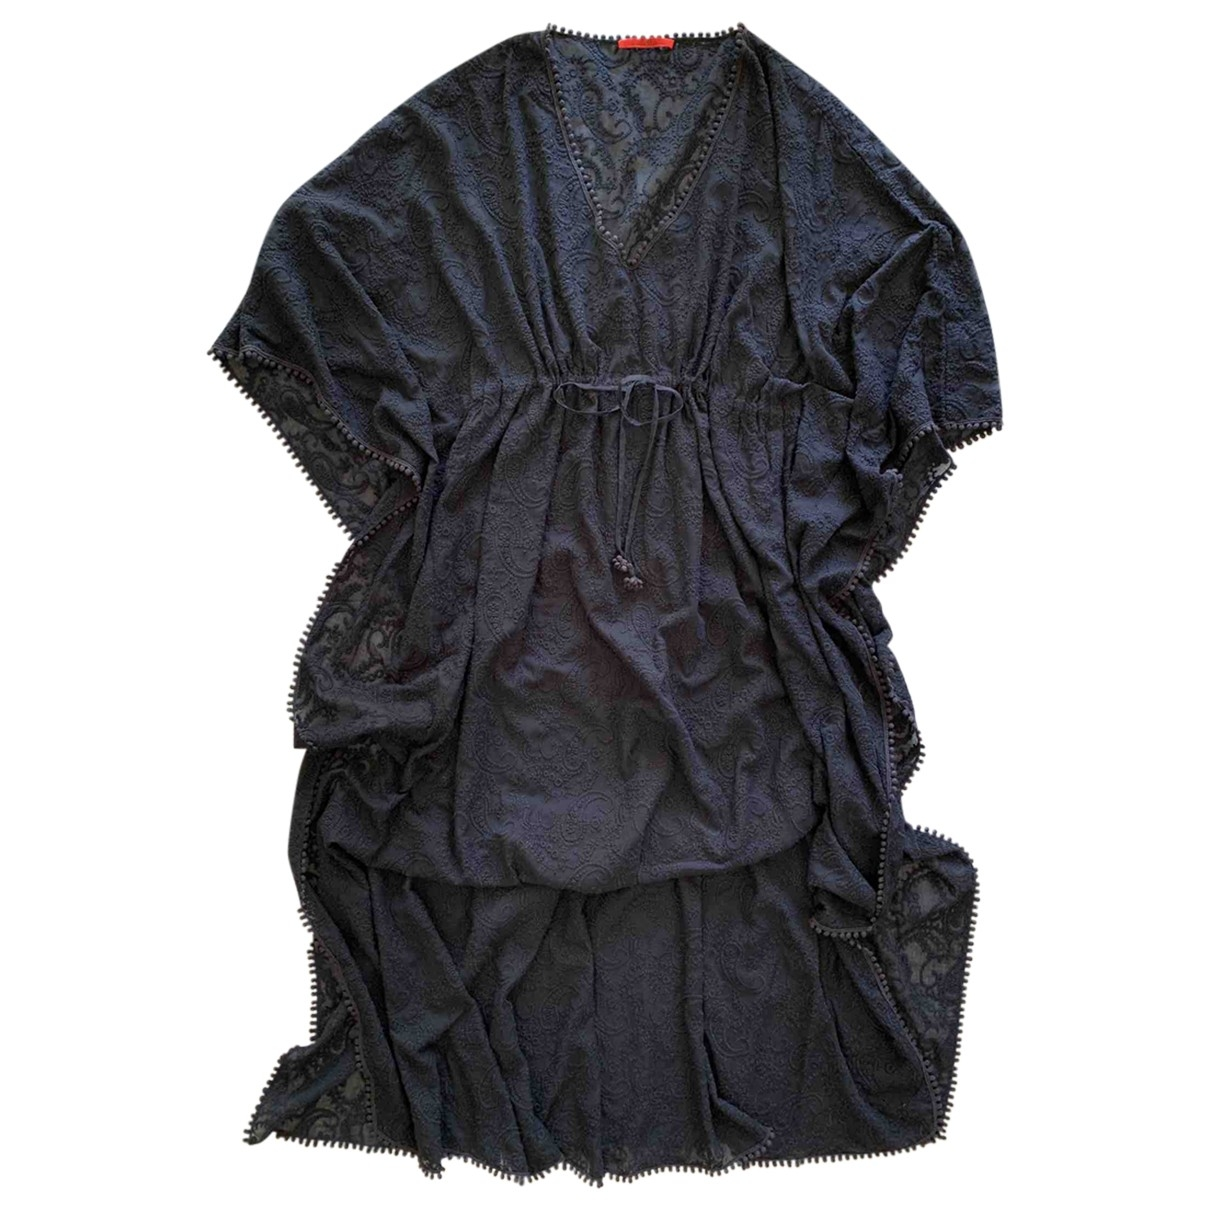 Carolina Herrera \N Blue Lace dress for Women L International